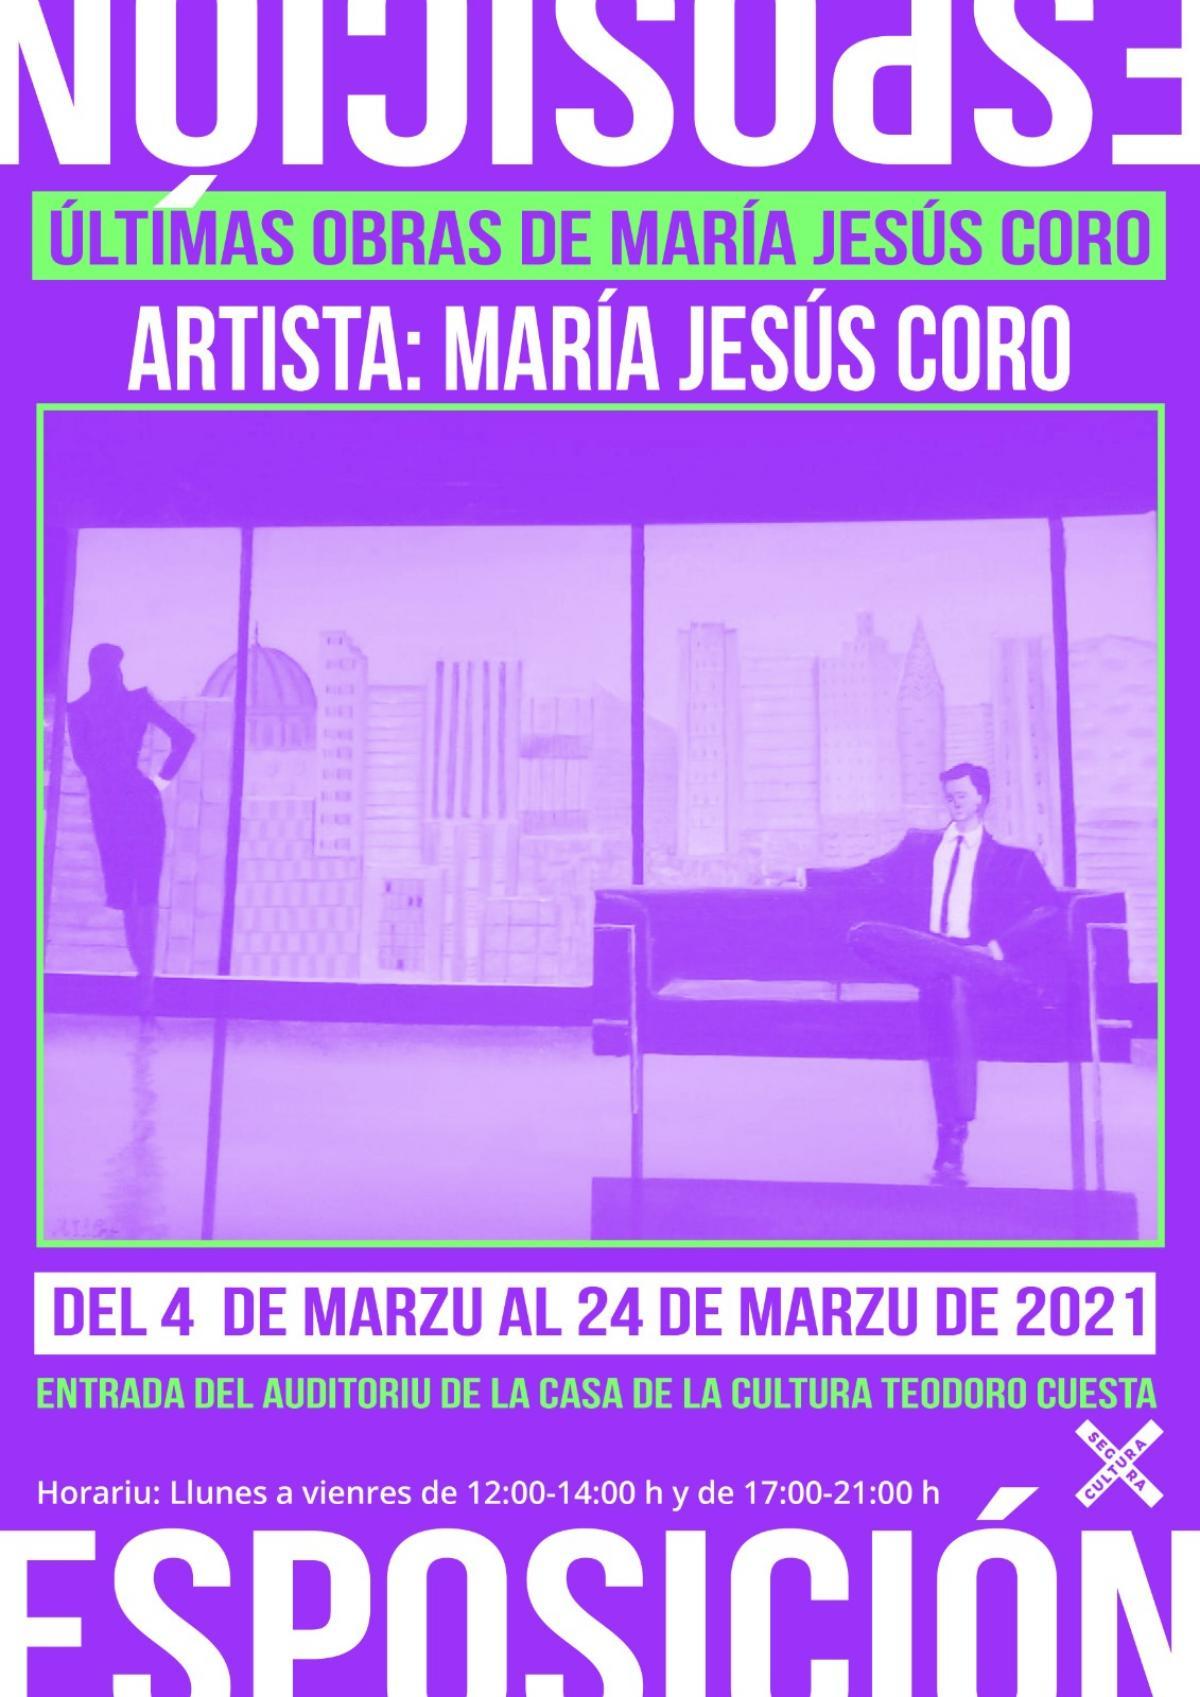 Expo Maria Jesus Coro